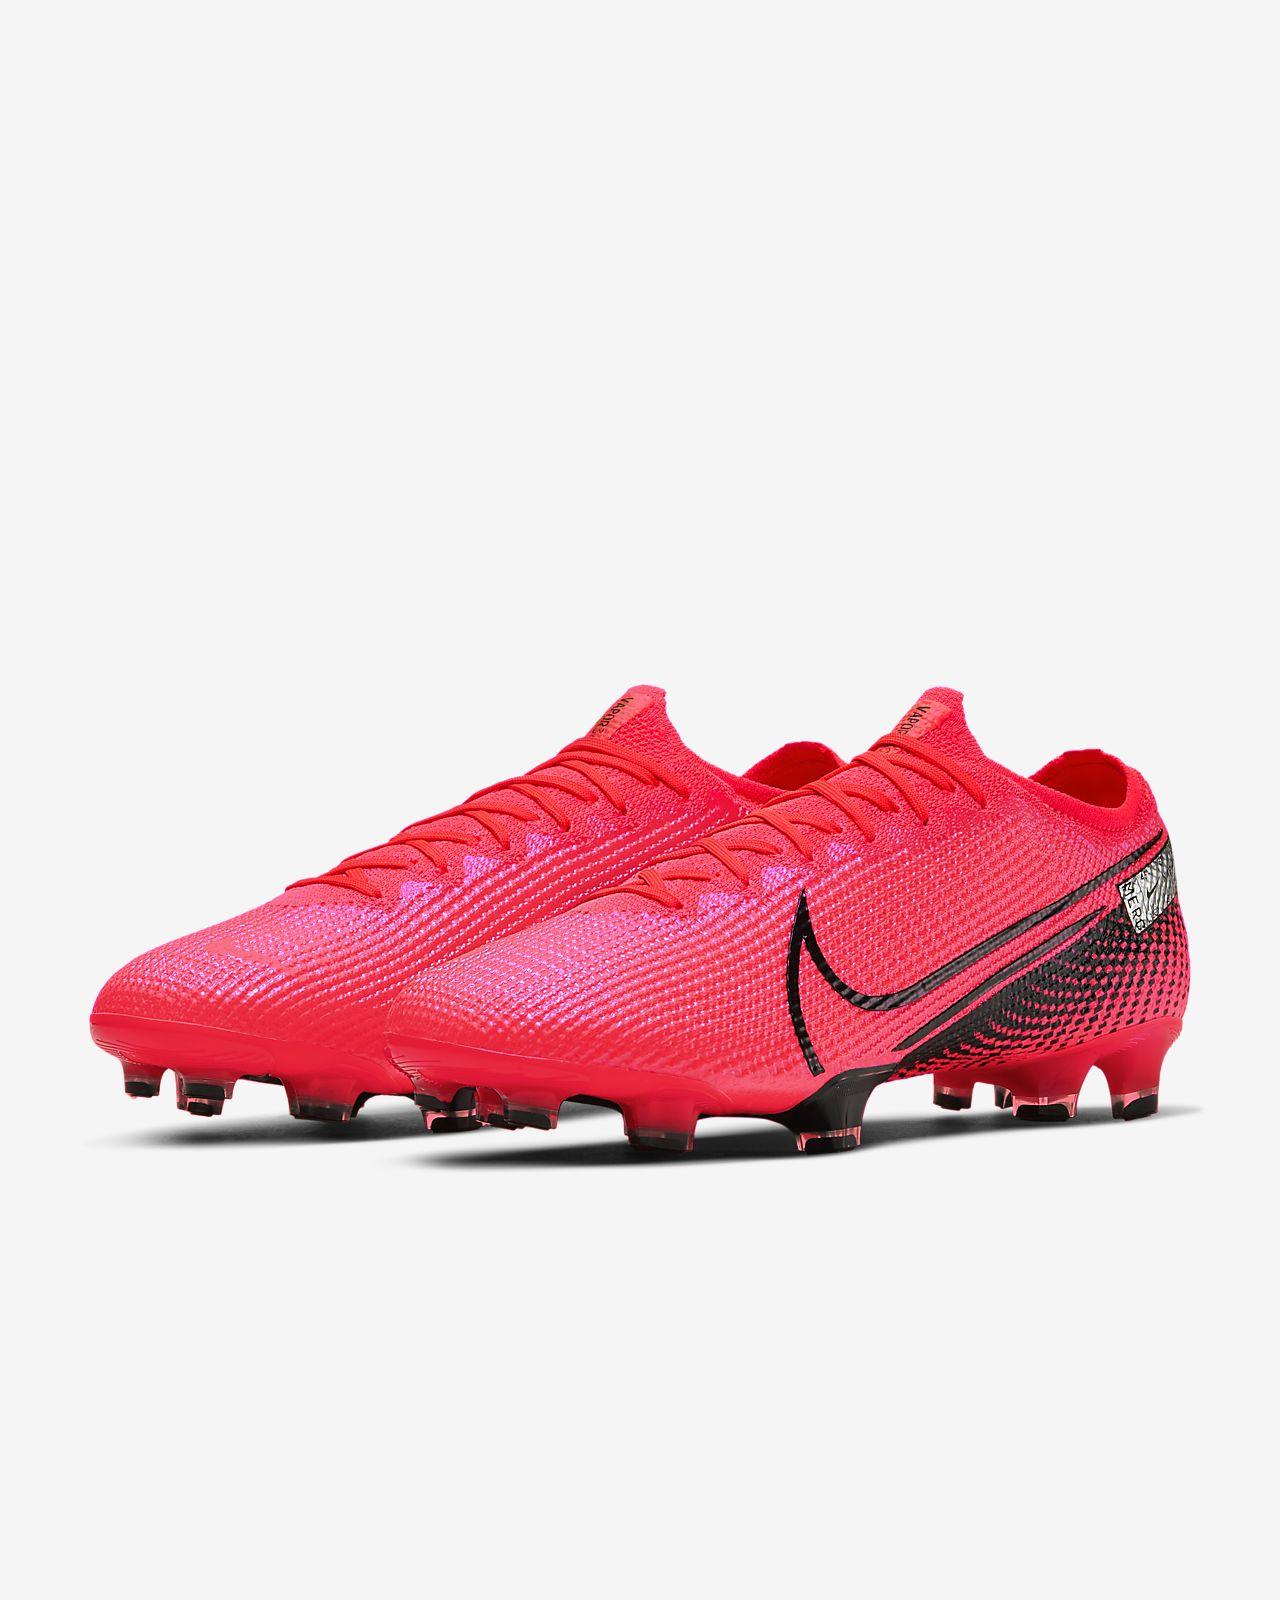 Nike Mercurial Vapor 13 Elite FG Firm Ground Football Boot